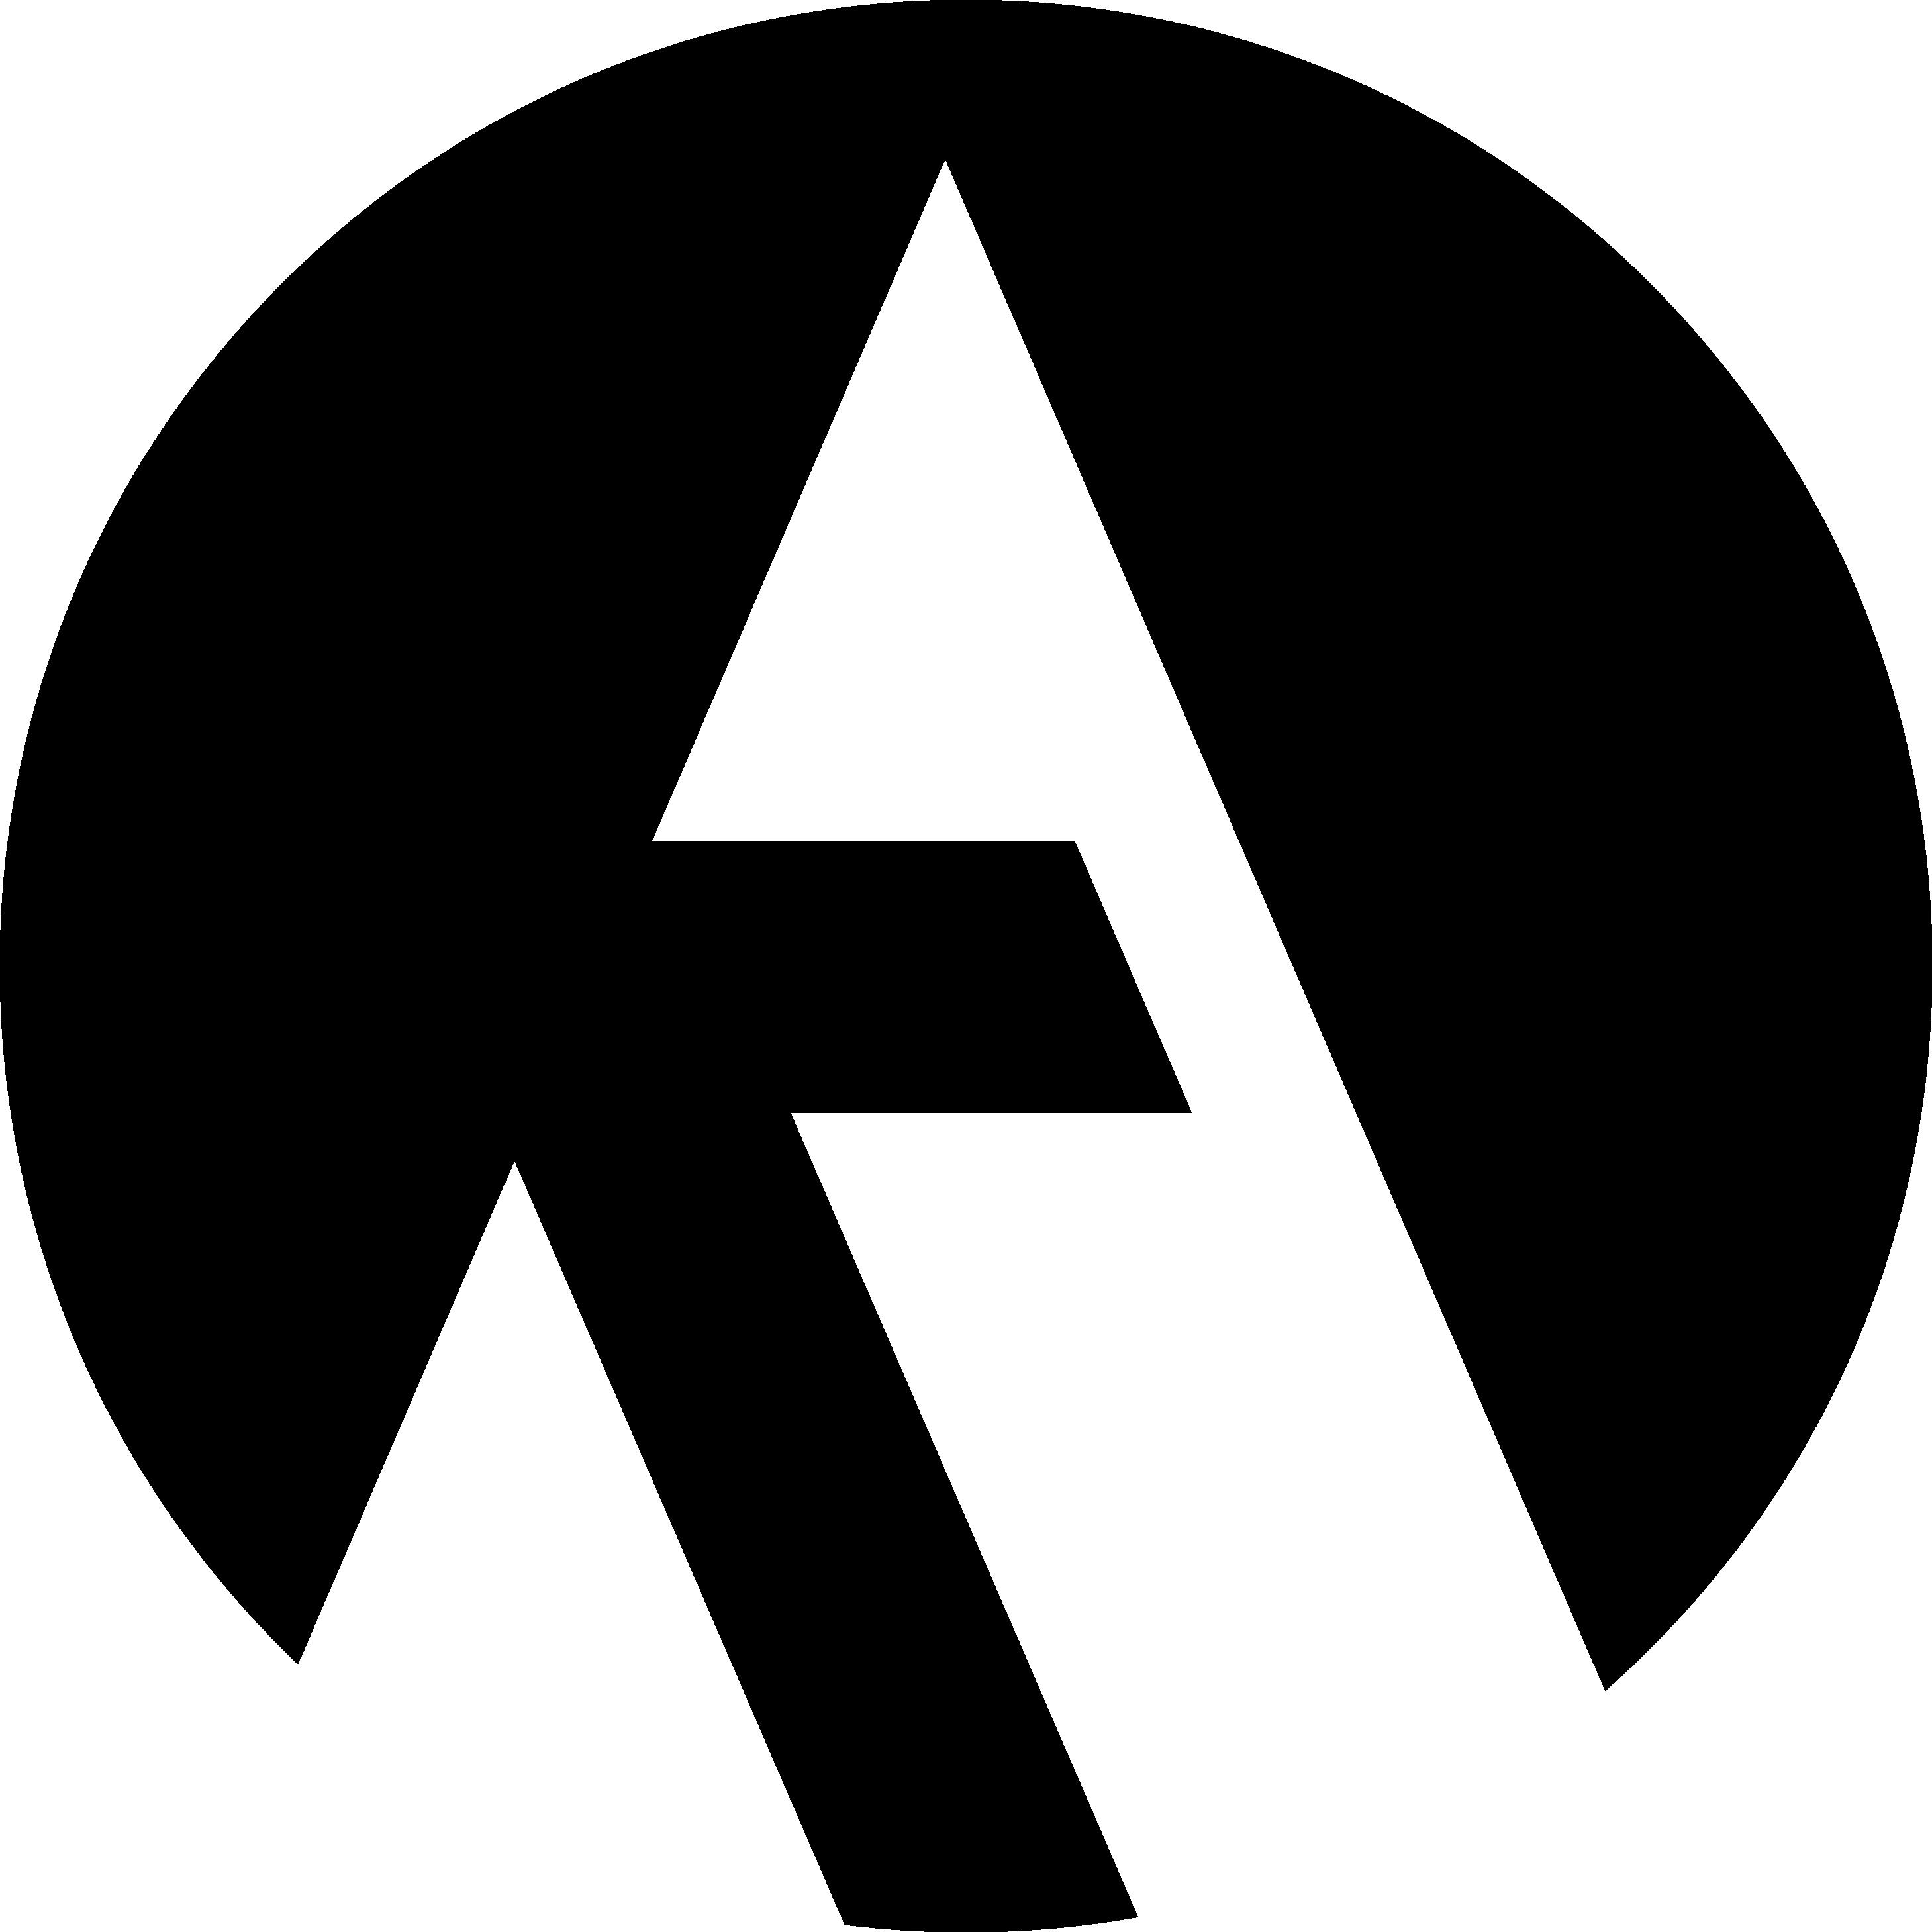 August Kyrø's portfolio